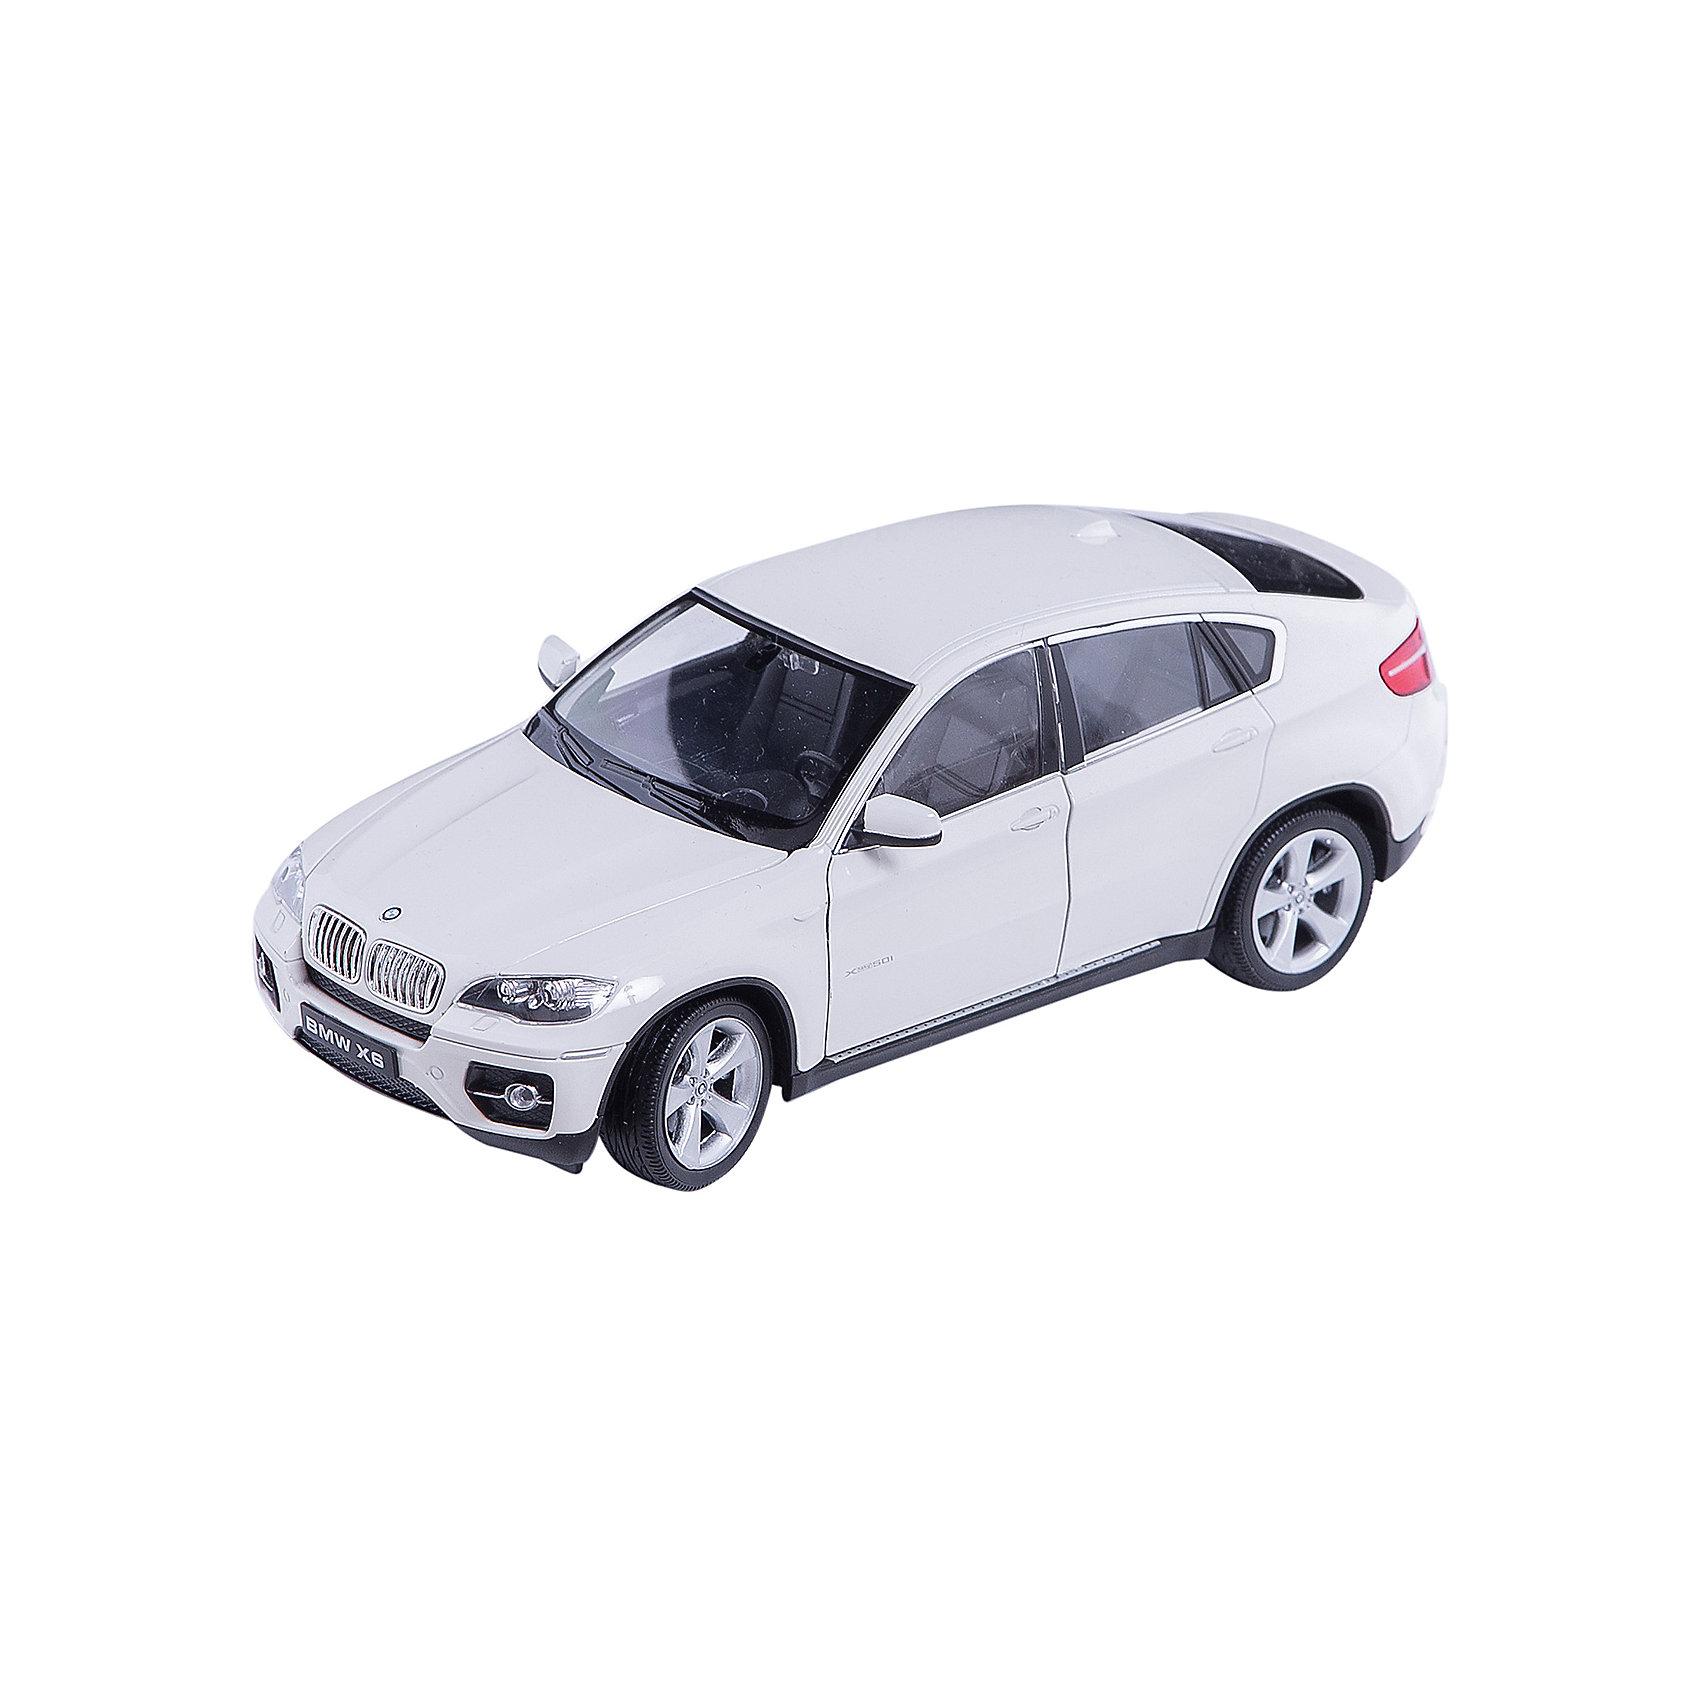 Welly Модель машины 1:24 BMW X6, Welly машина детская welly модель машины 1 24 bmw x6